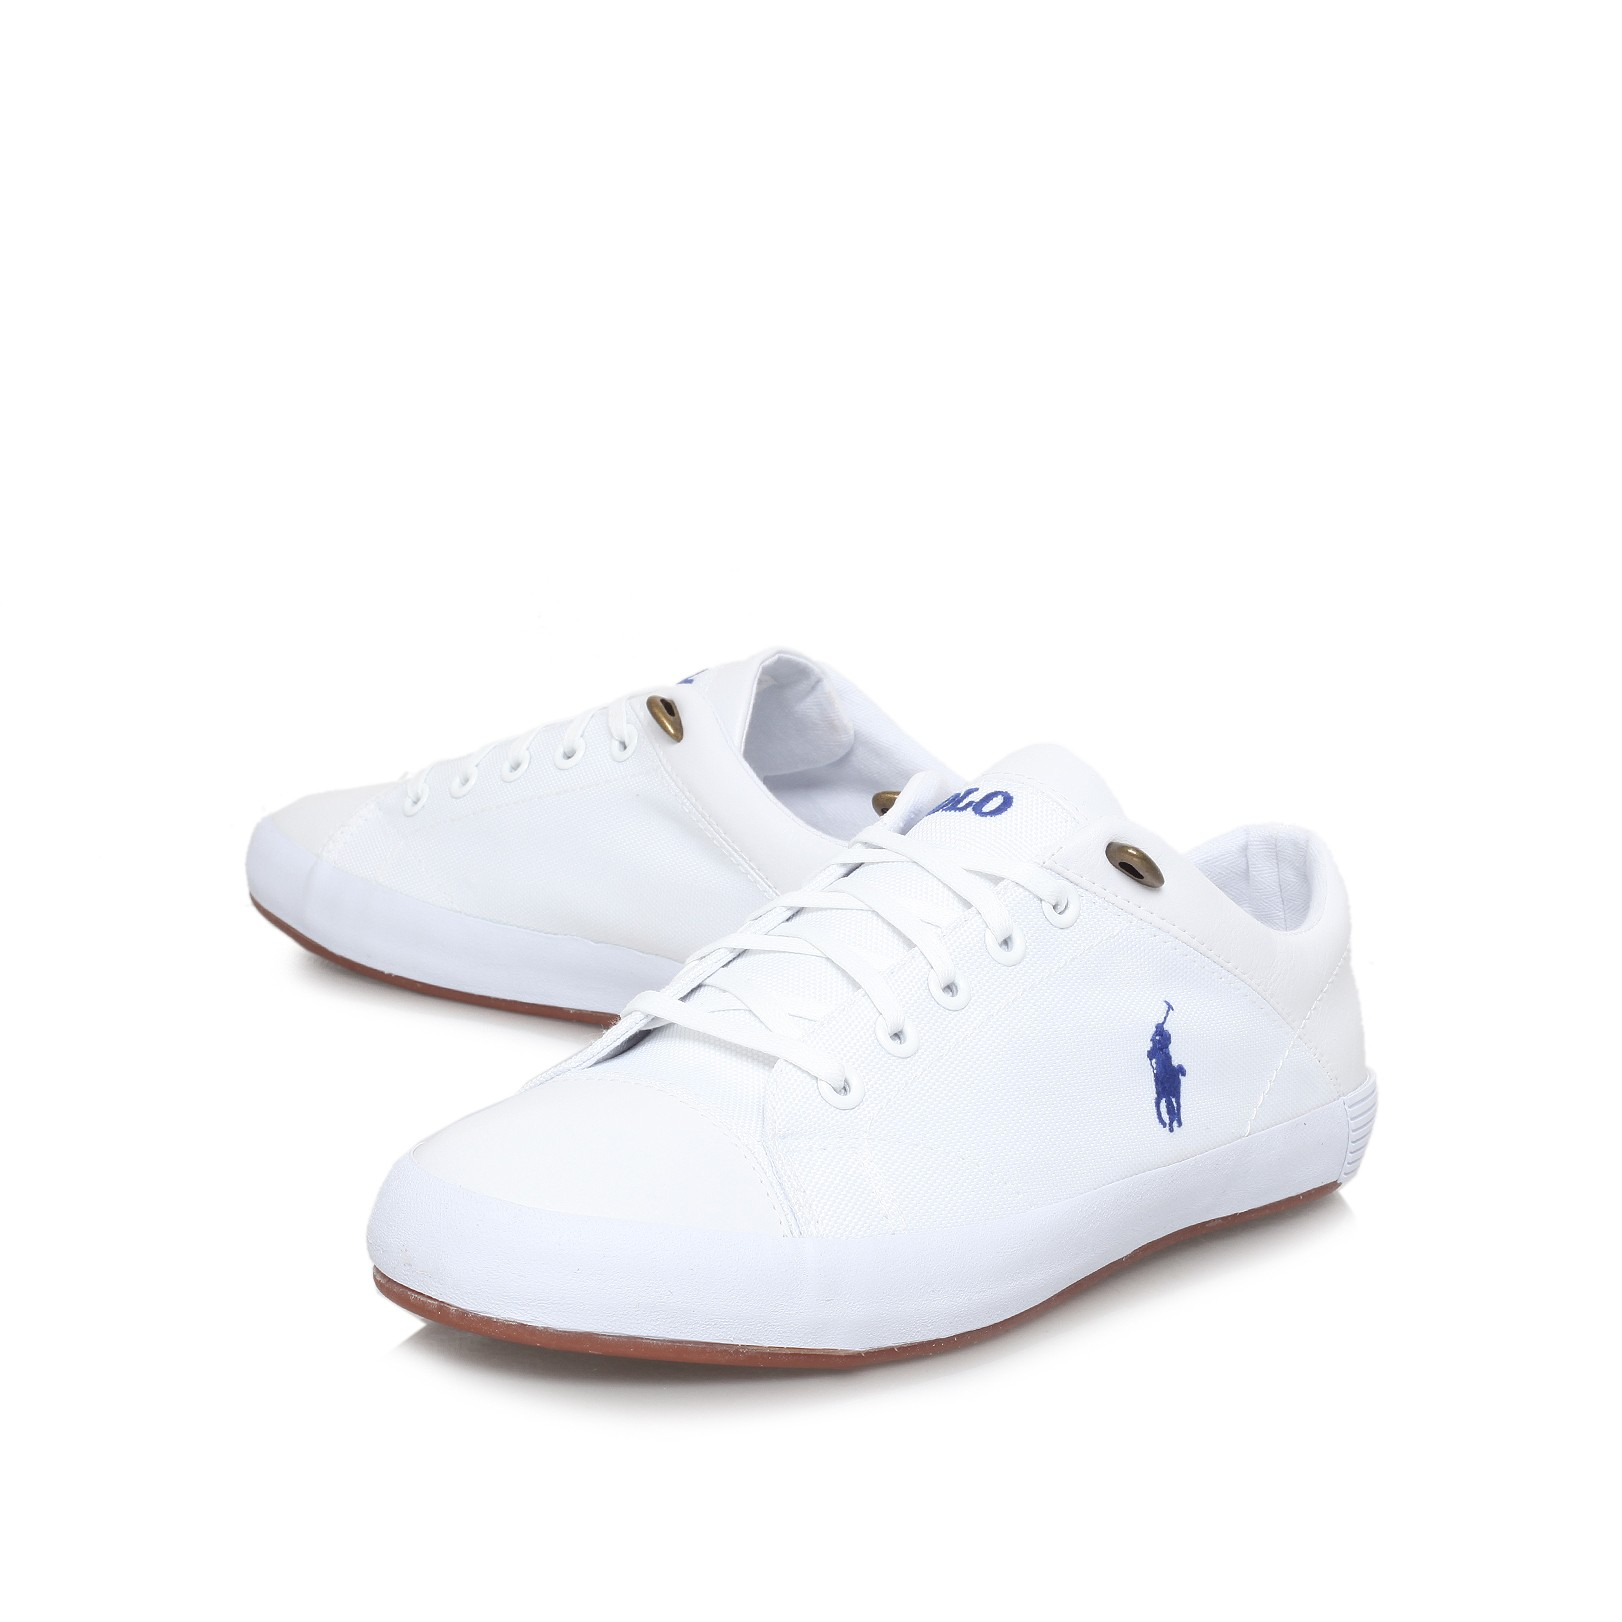 großer Verkauf erstklassig offizieller Shop Jerome Toecap Sneaker